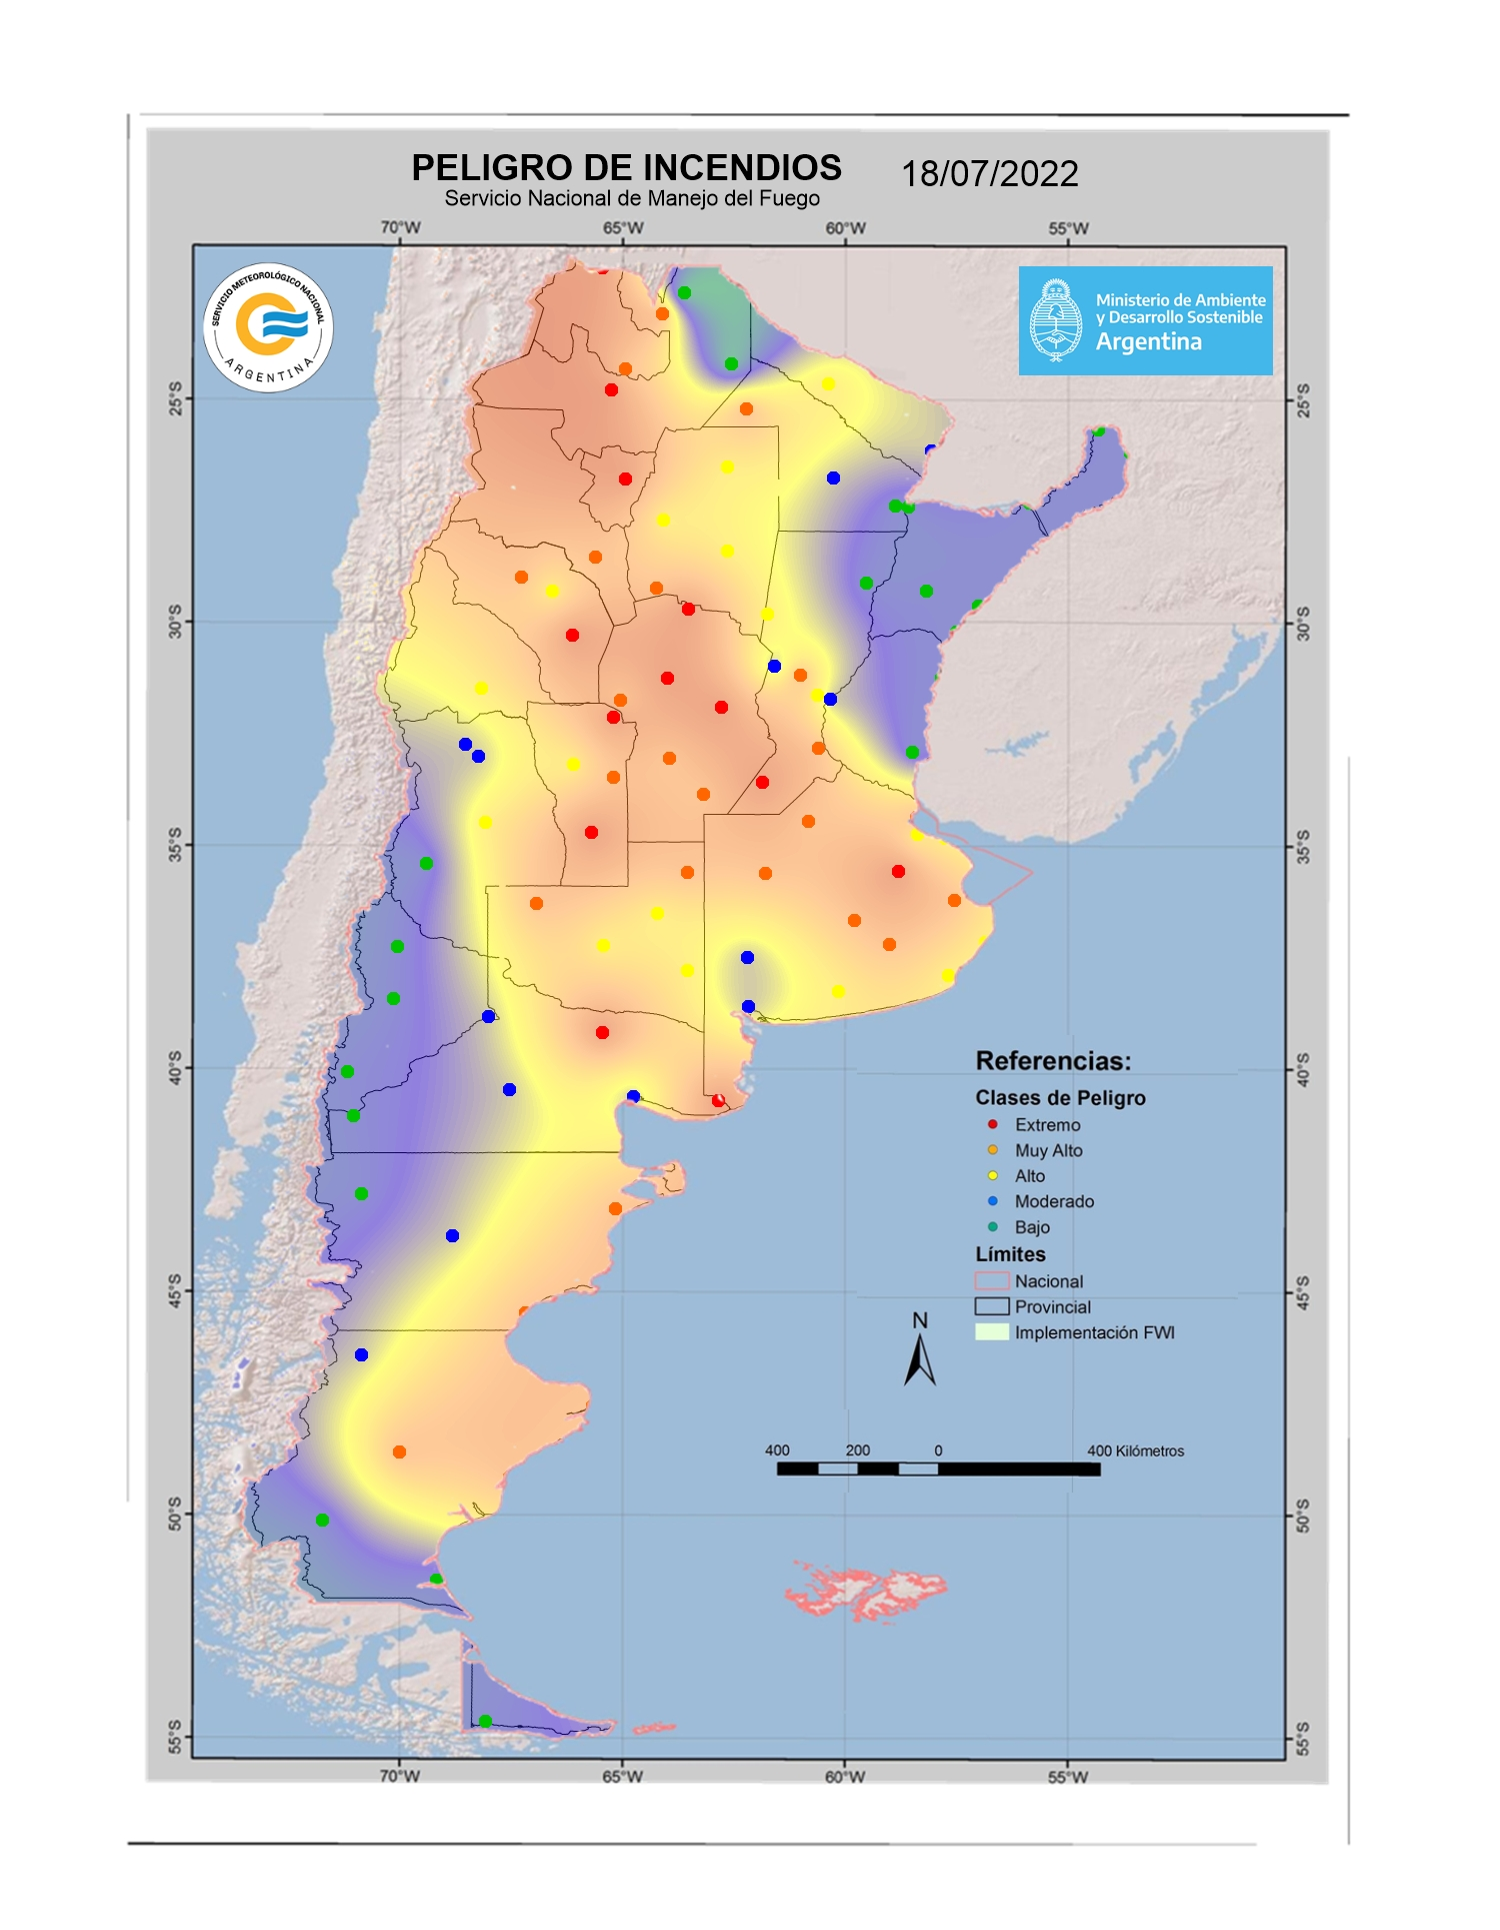 Mapa de indice de Peligro de Incendio DIA +3 a 72hs